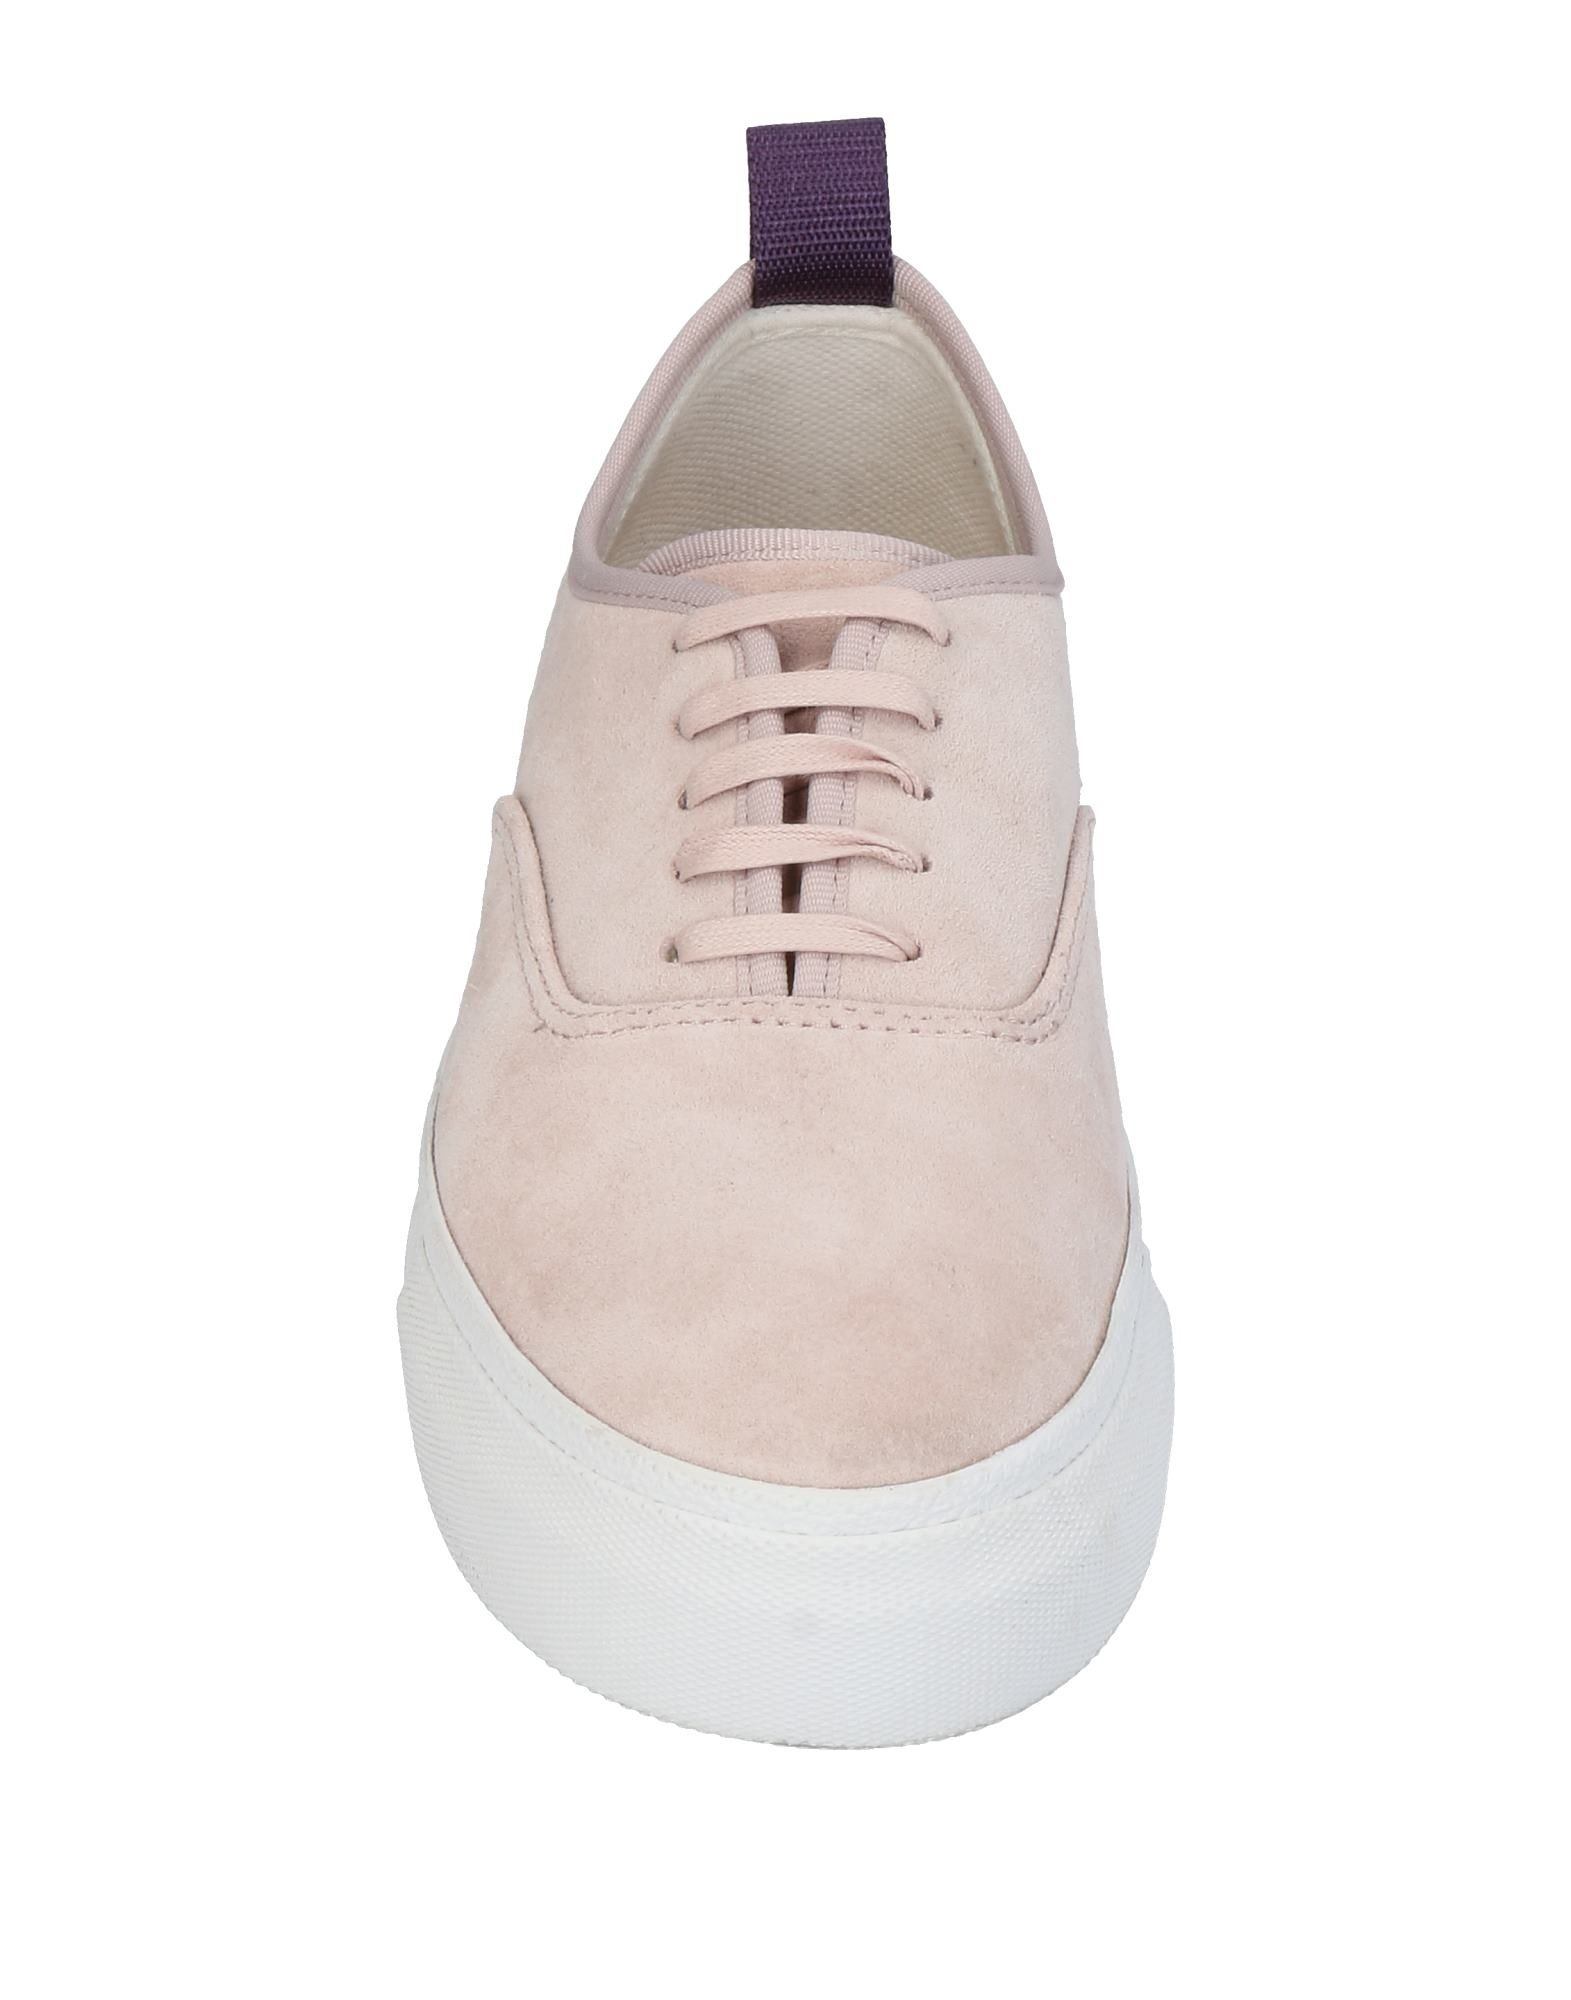 Eytys Sneakers Damen beliebte  11422456GX Gute Qualität beliebte Damen Schuhe 269894